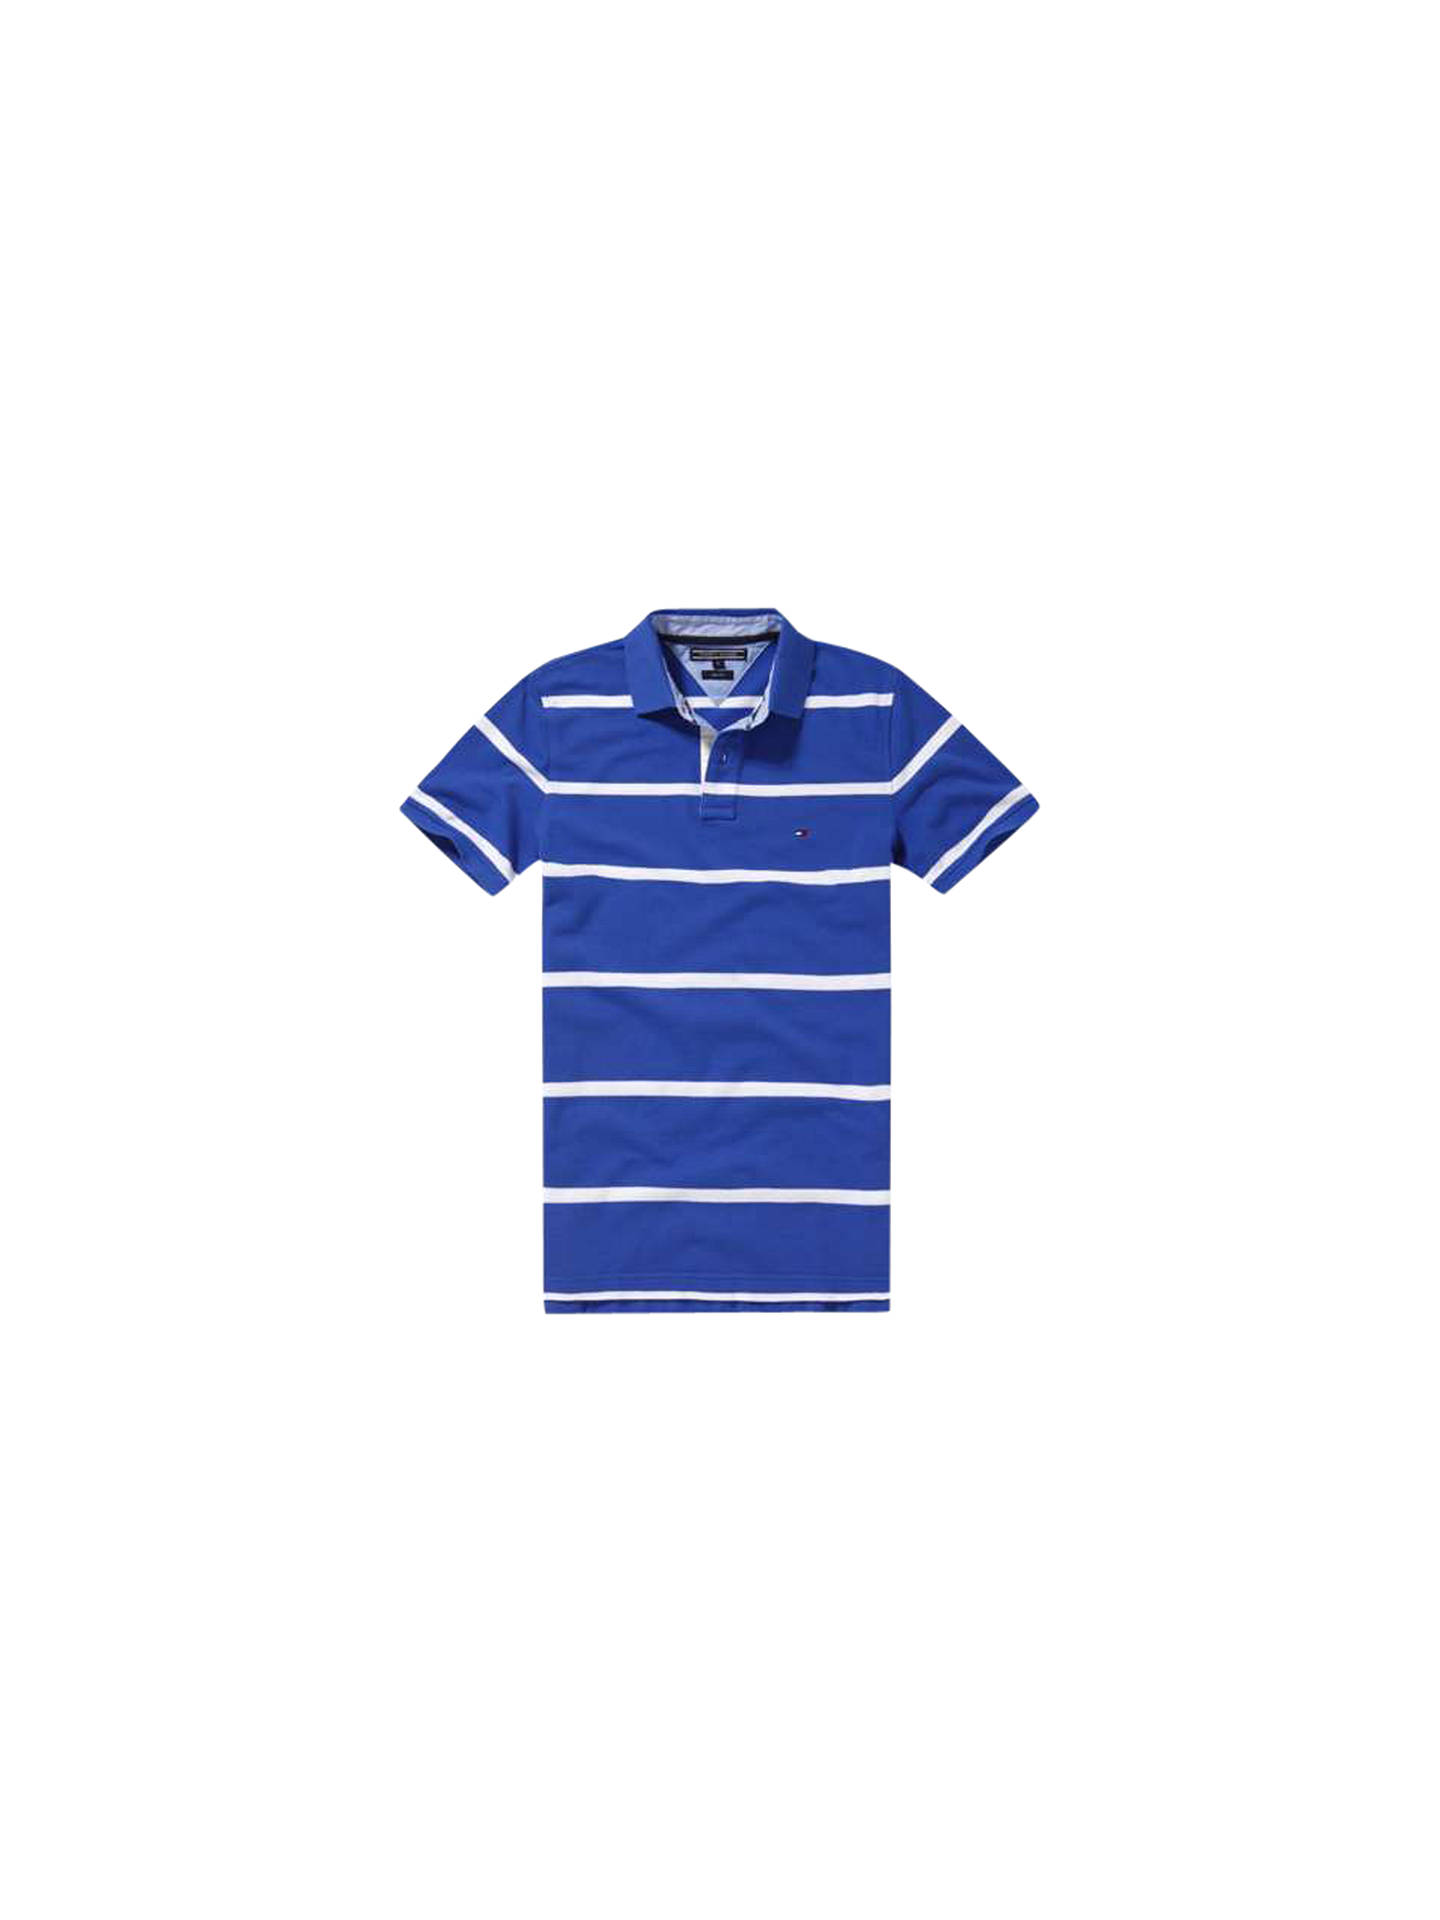 b5b13260a72cb Tommy Hilfiger Bar Stripe Slim Fit Polo Shirt at John Lewis   Partners